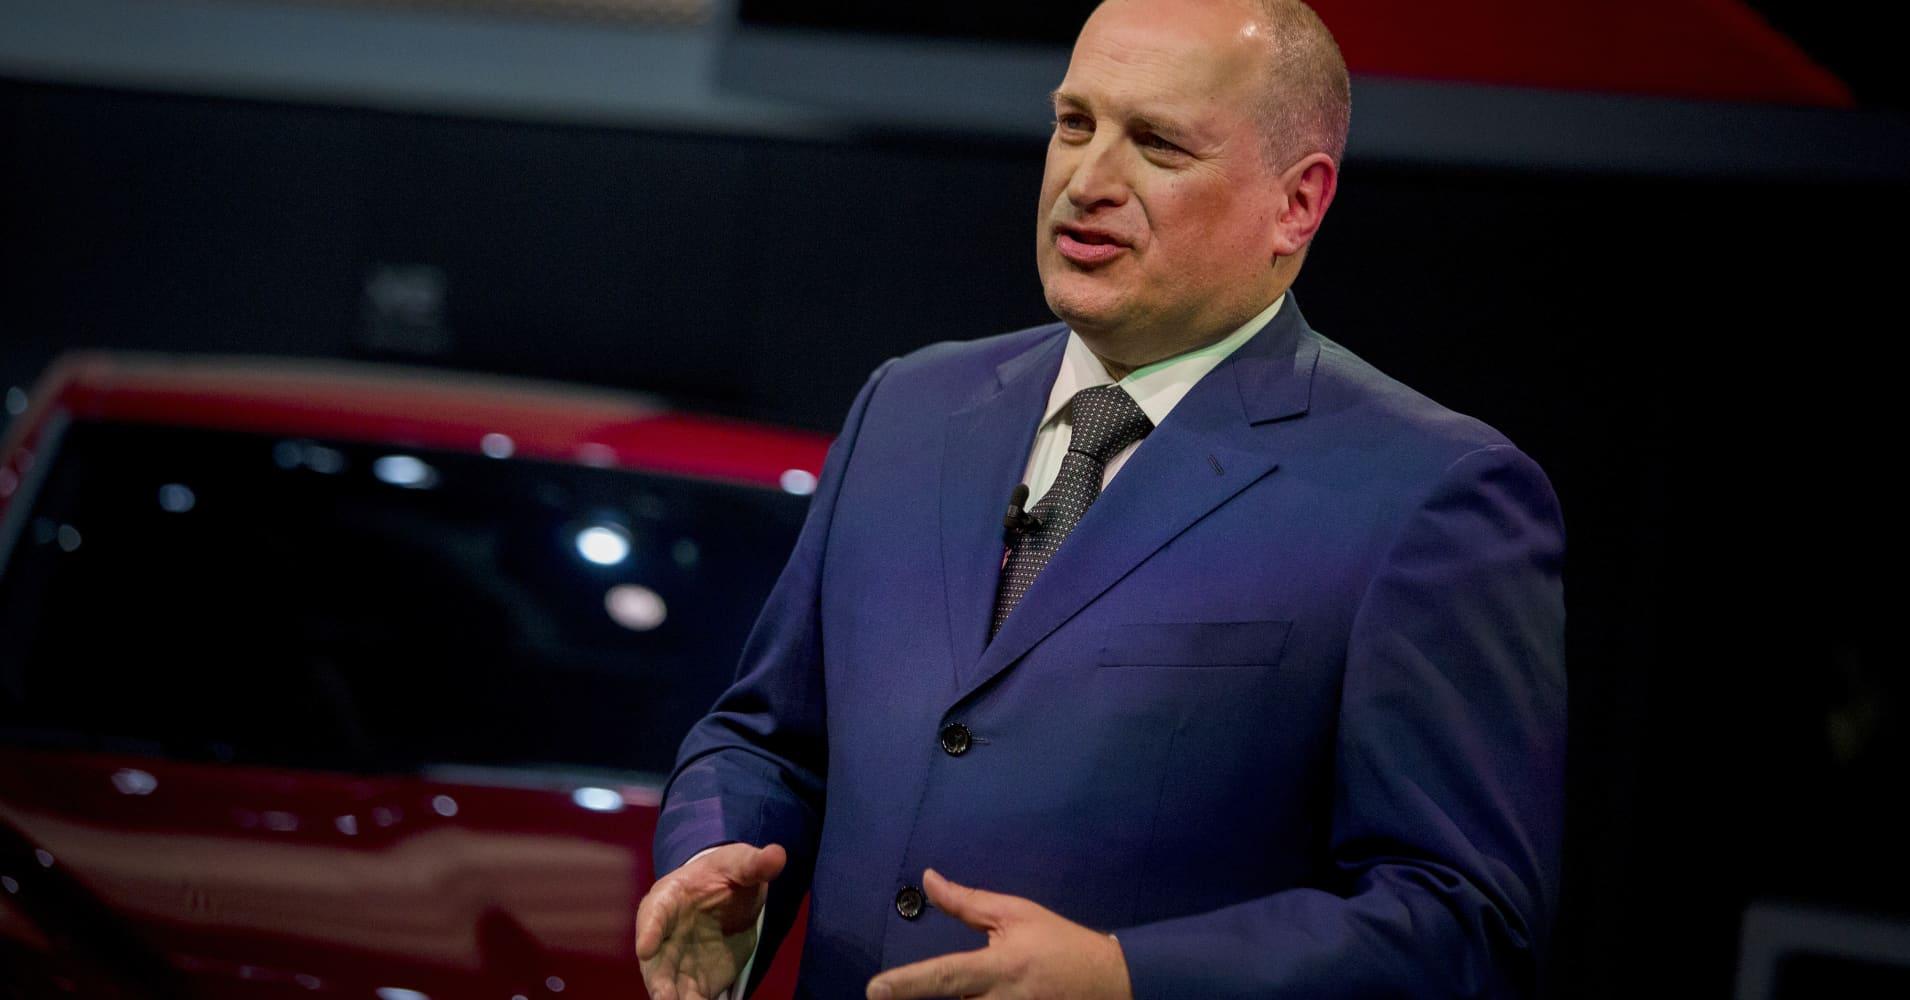 Jaguar Land Rover global executive Joe Eberhardt has a plan to make profits